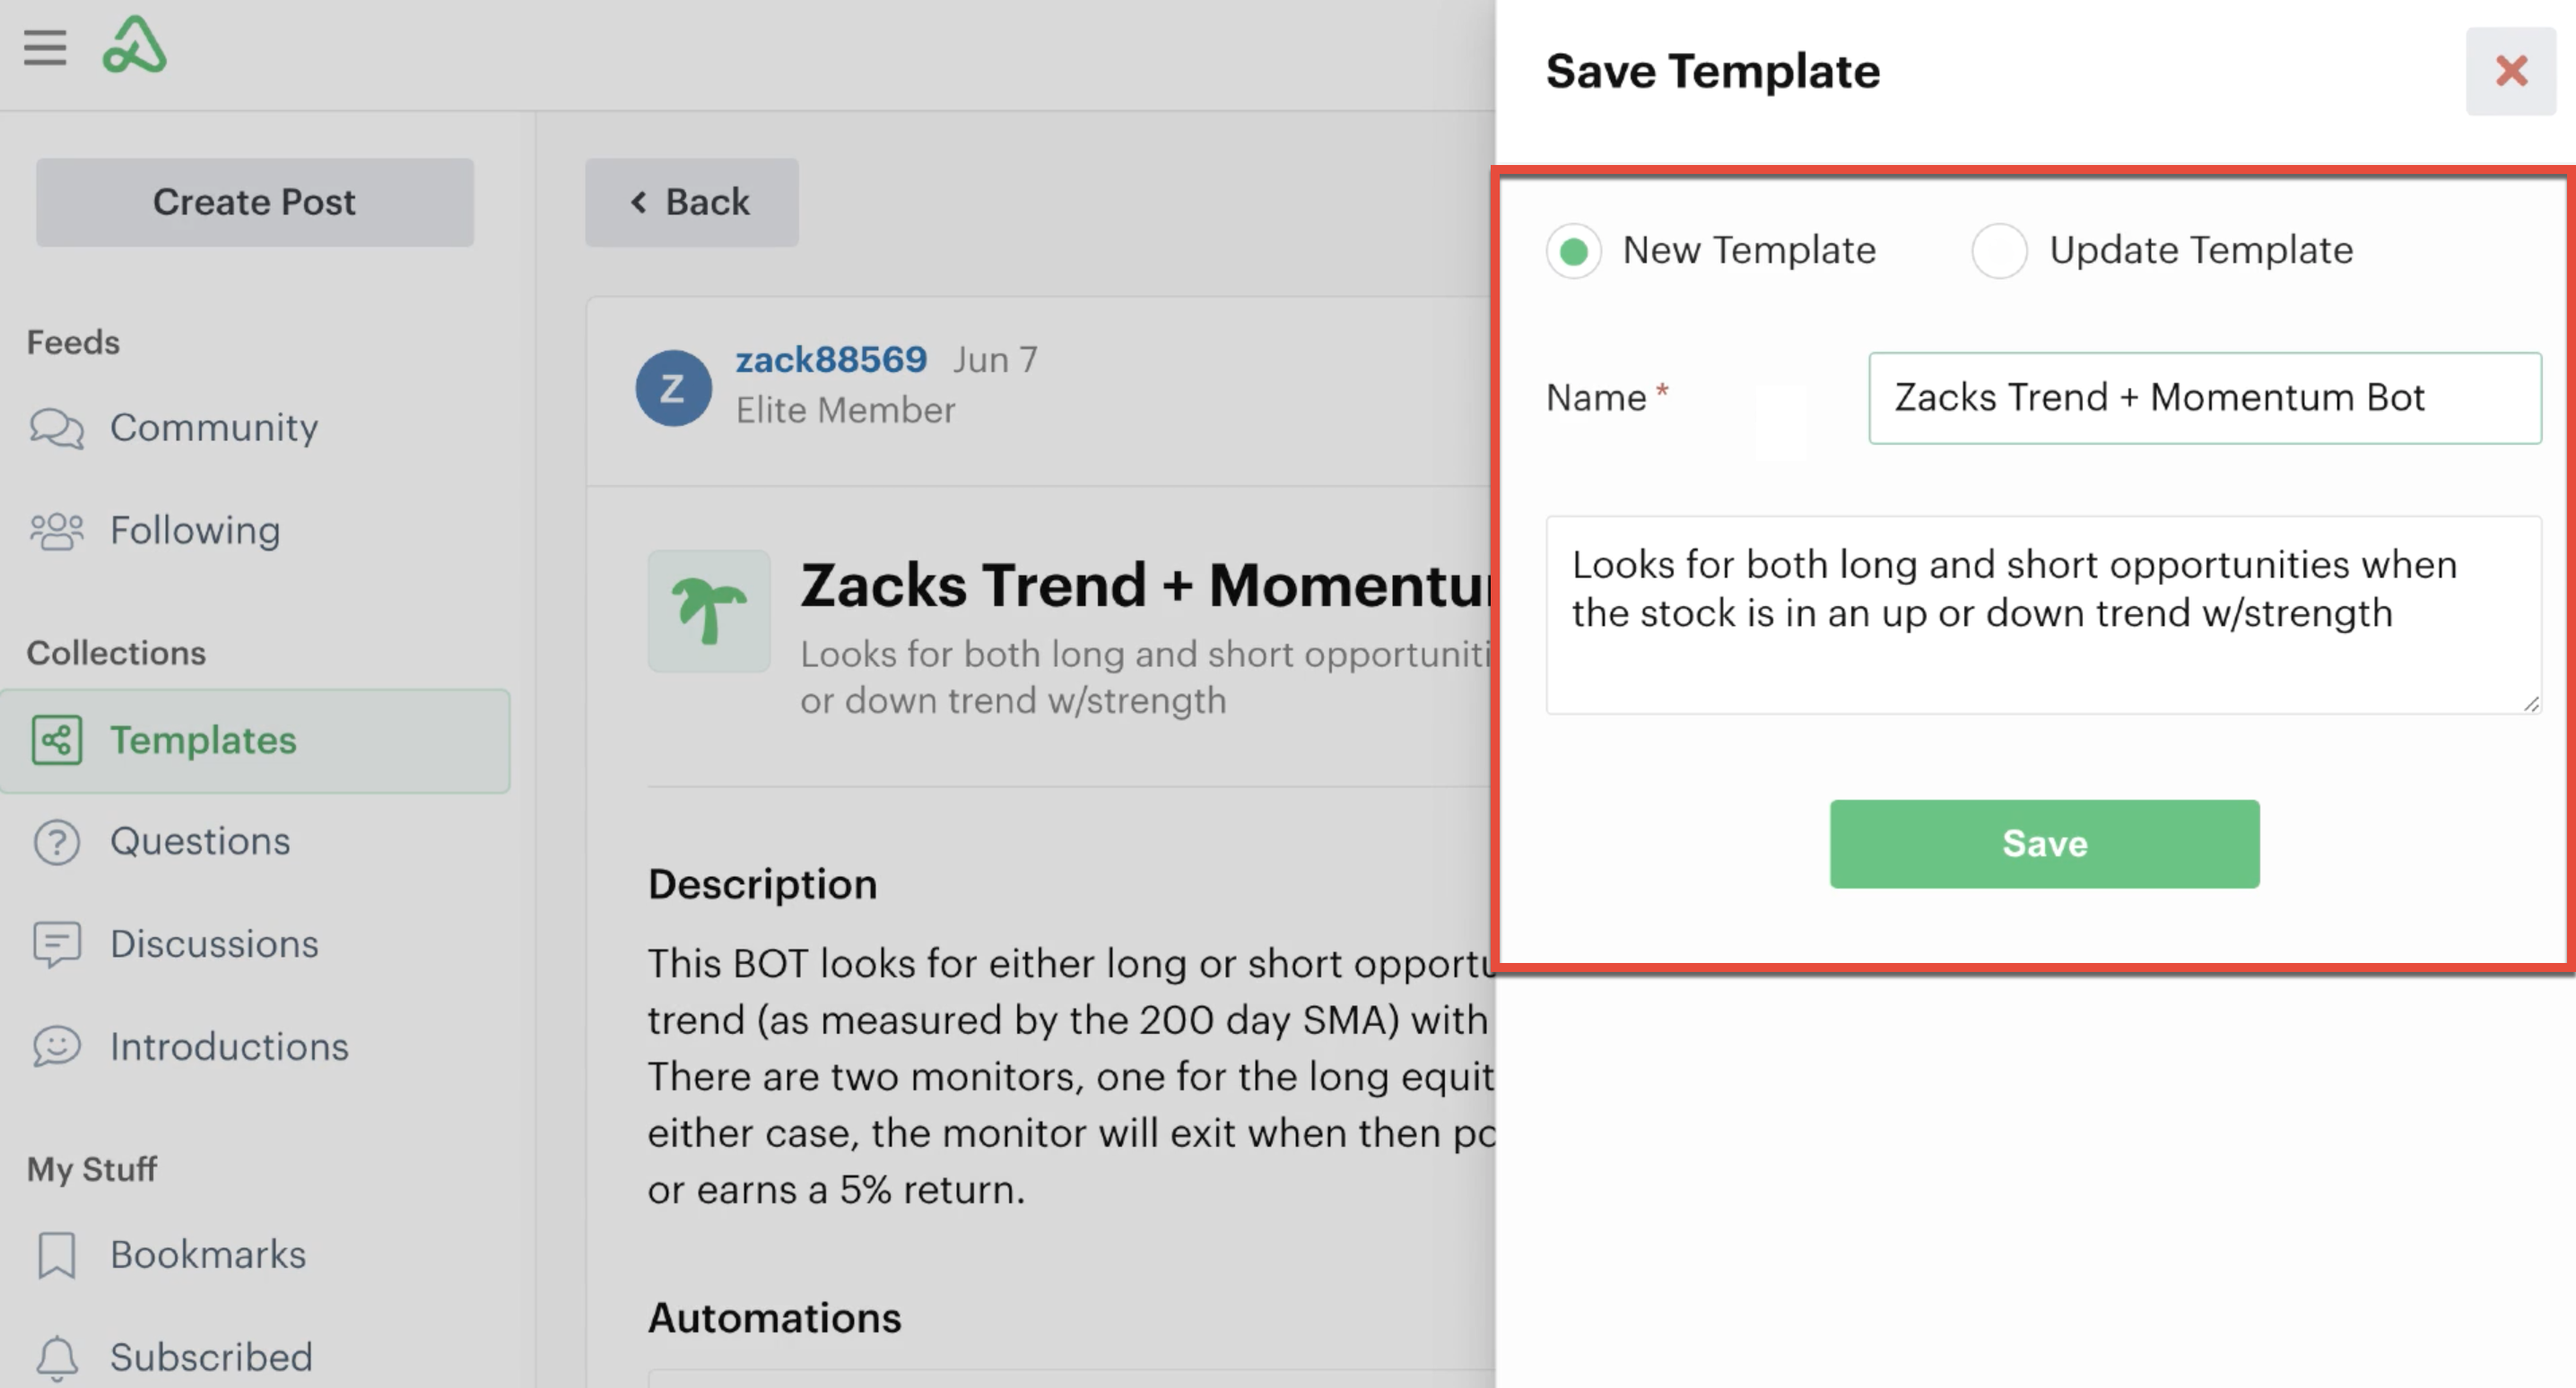 Save template